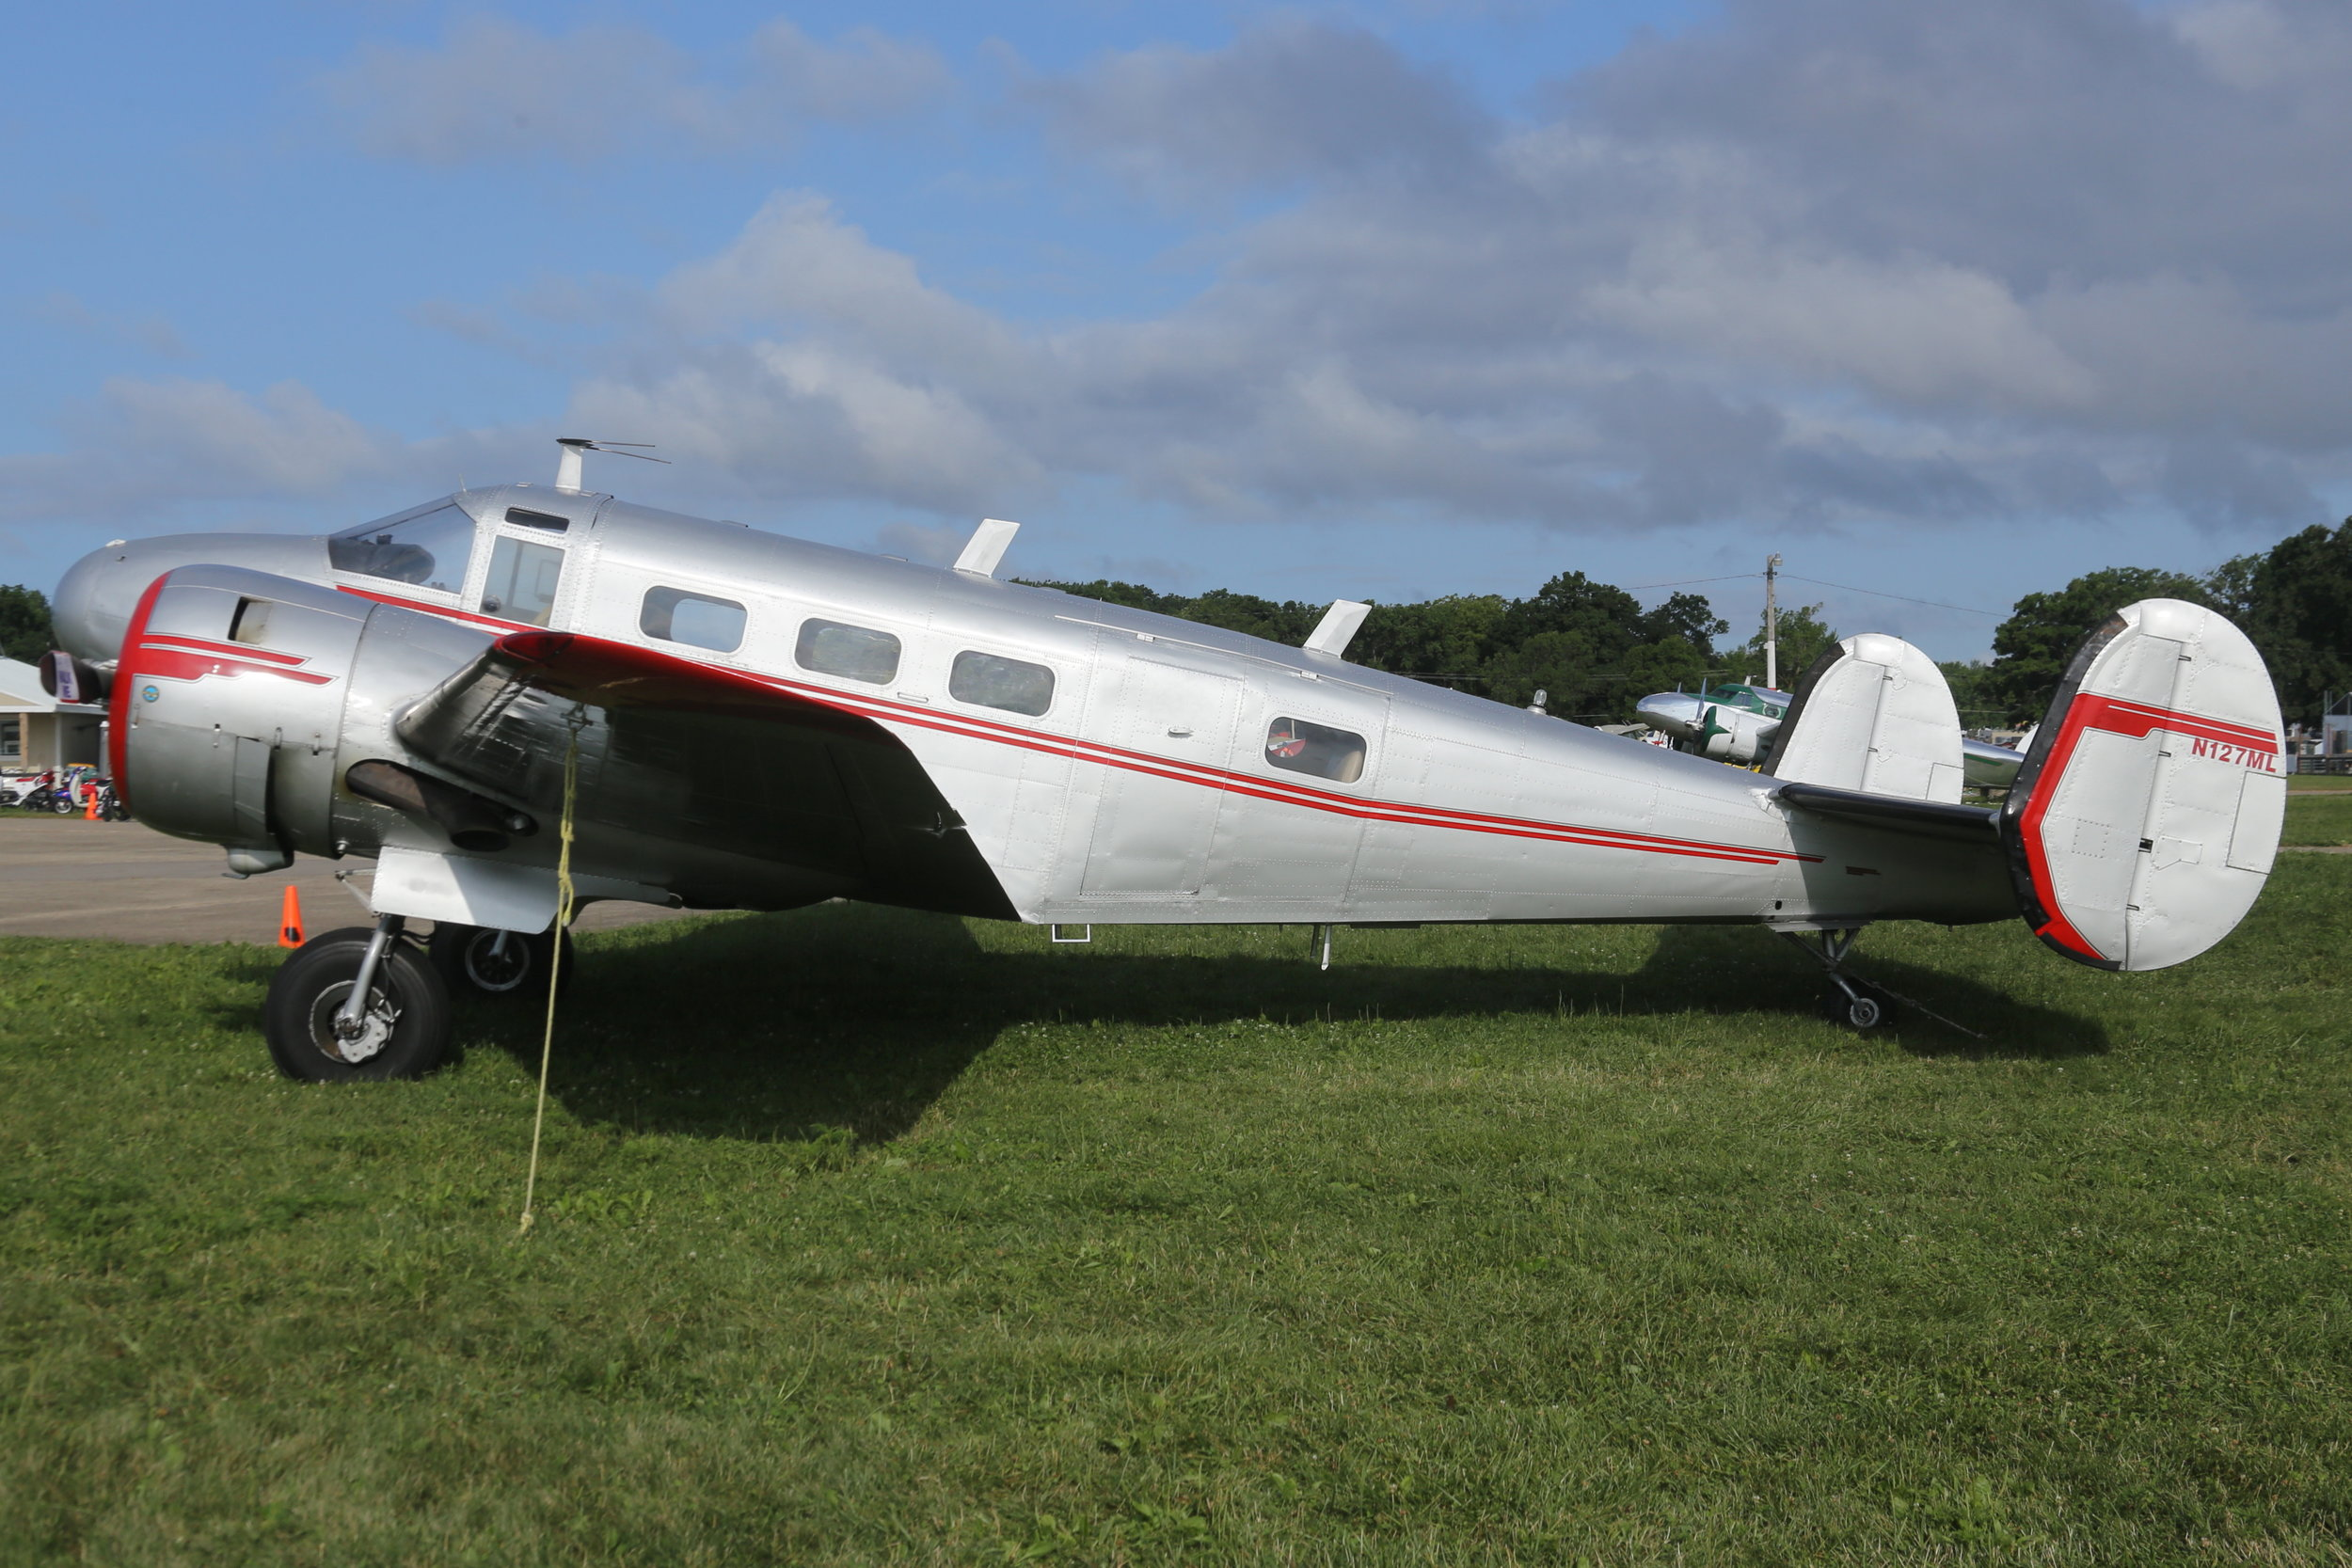 N127ML National Air Service Beech 18 taken at Oshkosh 27th July 2018 by John Wood